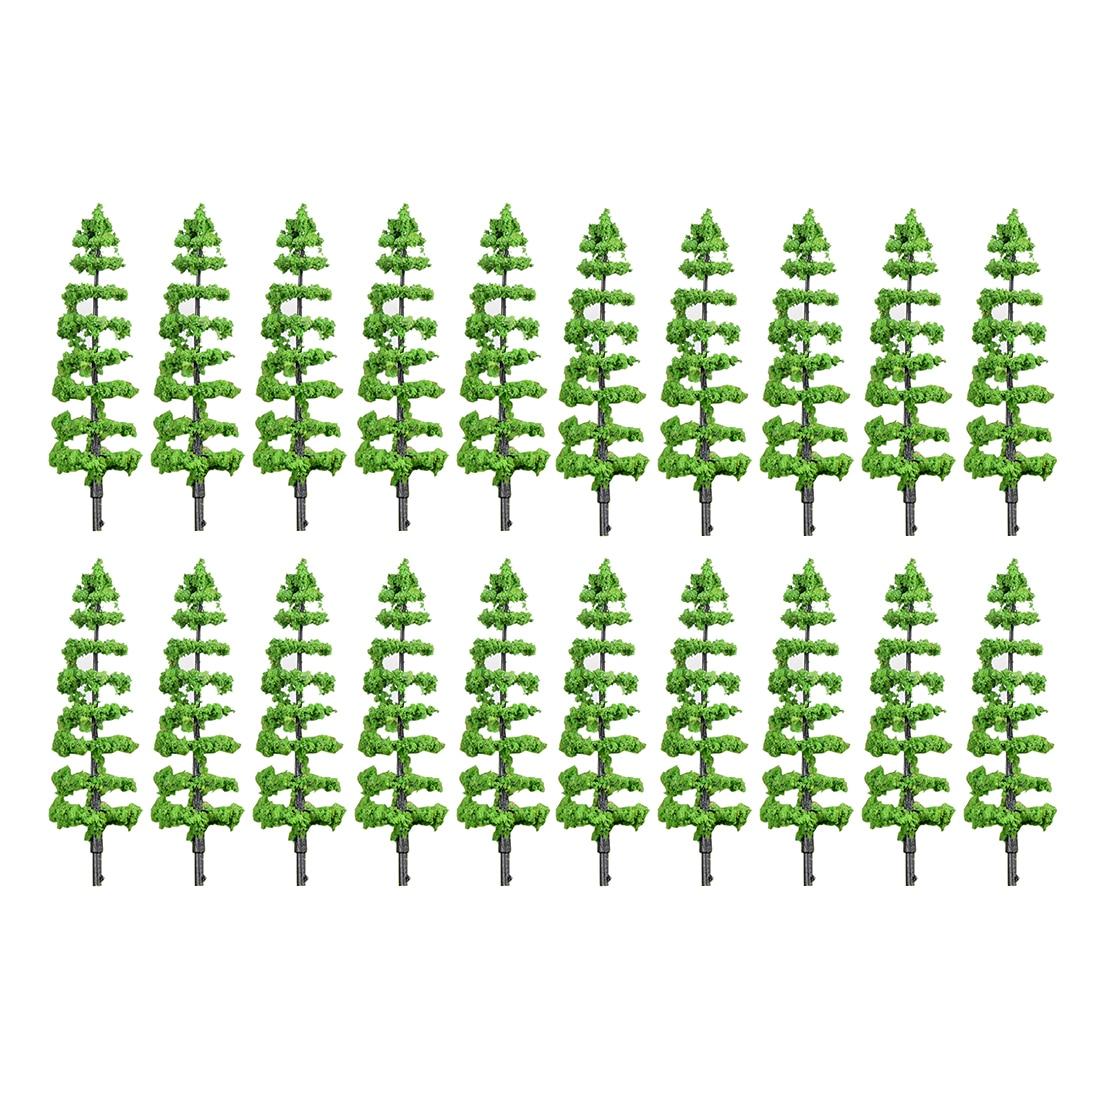 20 piezas 6,9/9,2 cm HO 1 85 escala gran tamaño Redwood modelo árbol ferrocarril arquitectura Diorama árbol para DIY paisaje